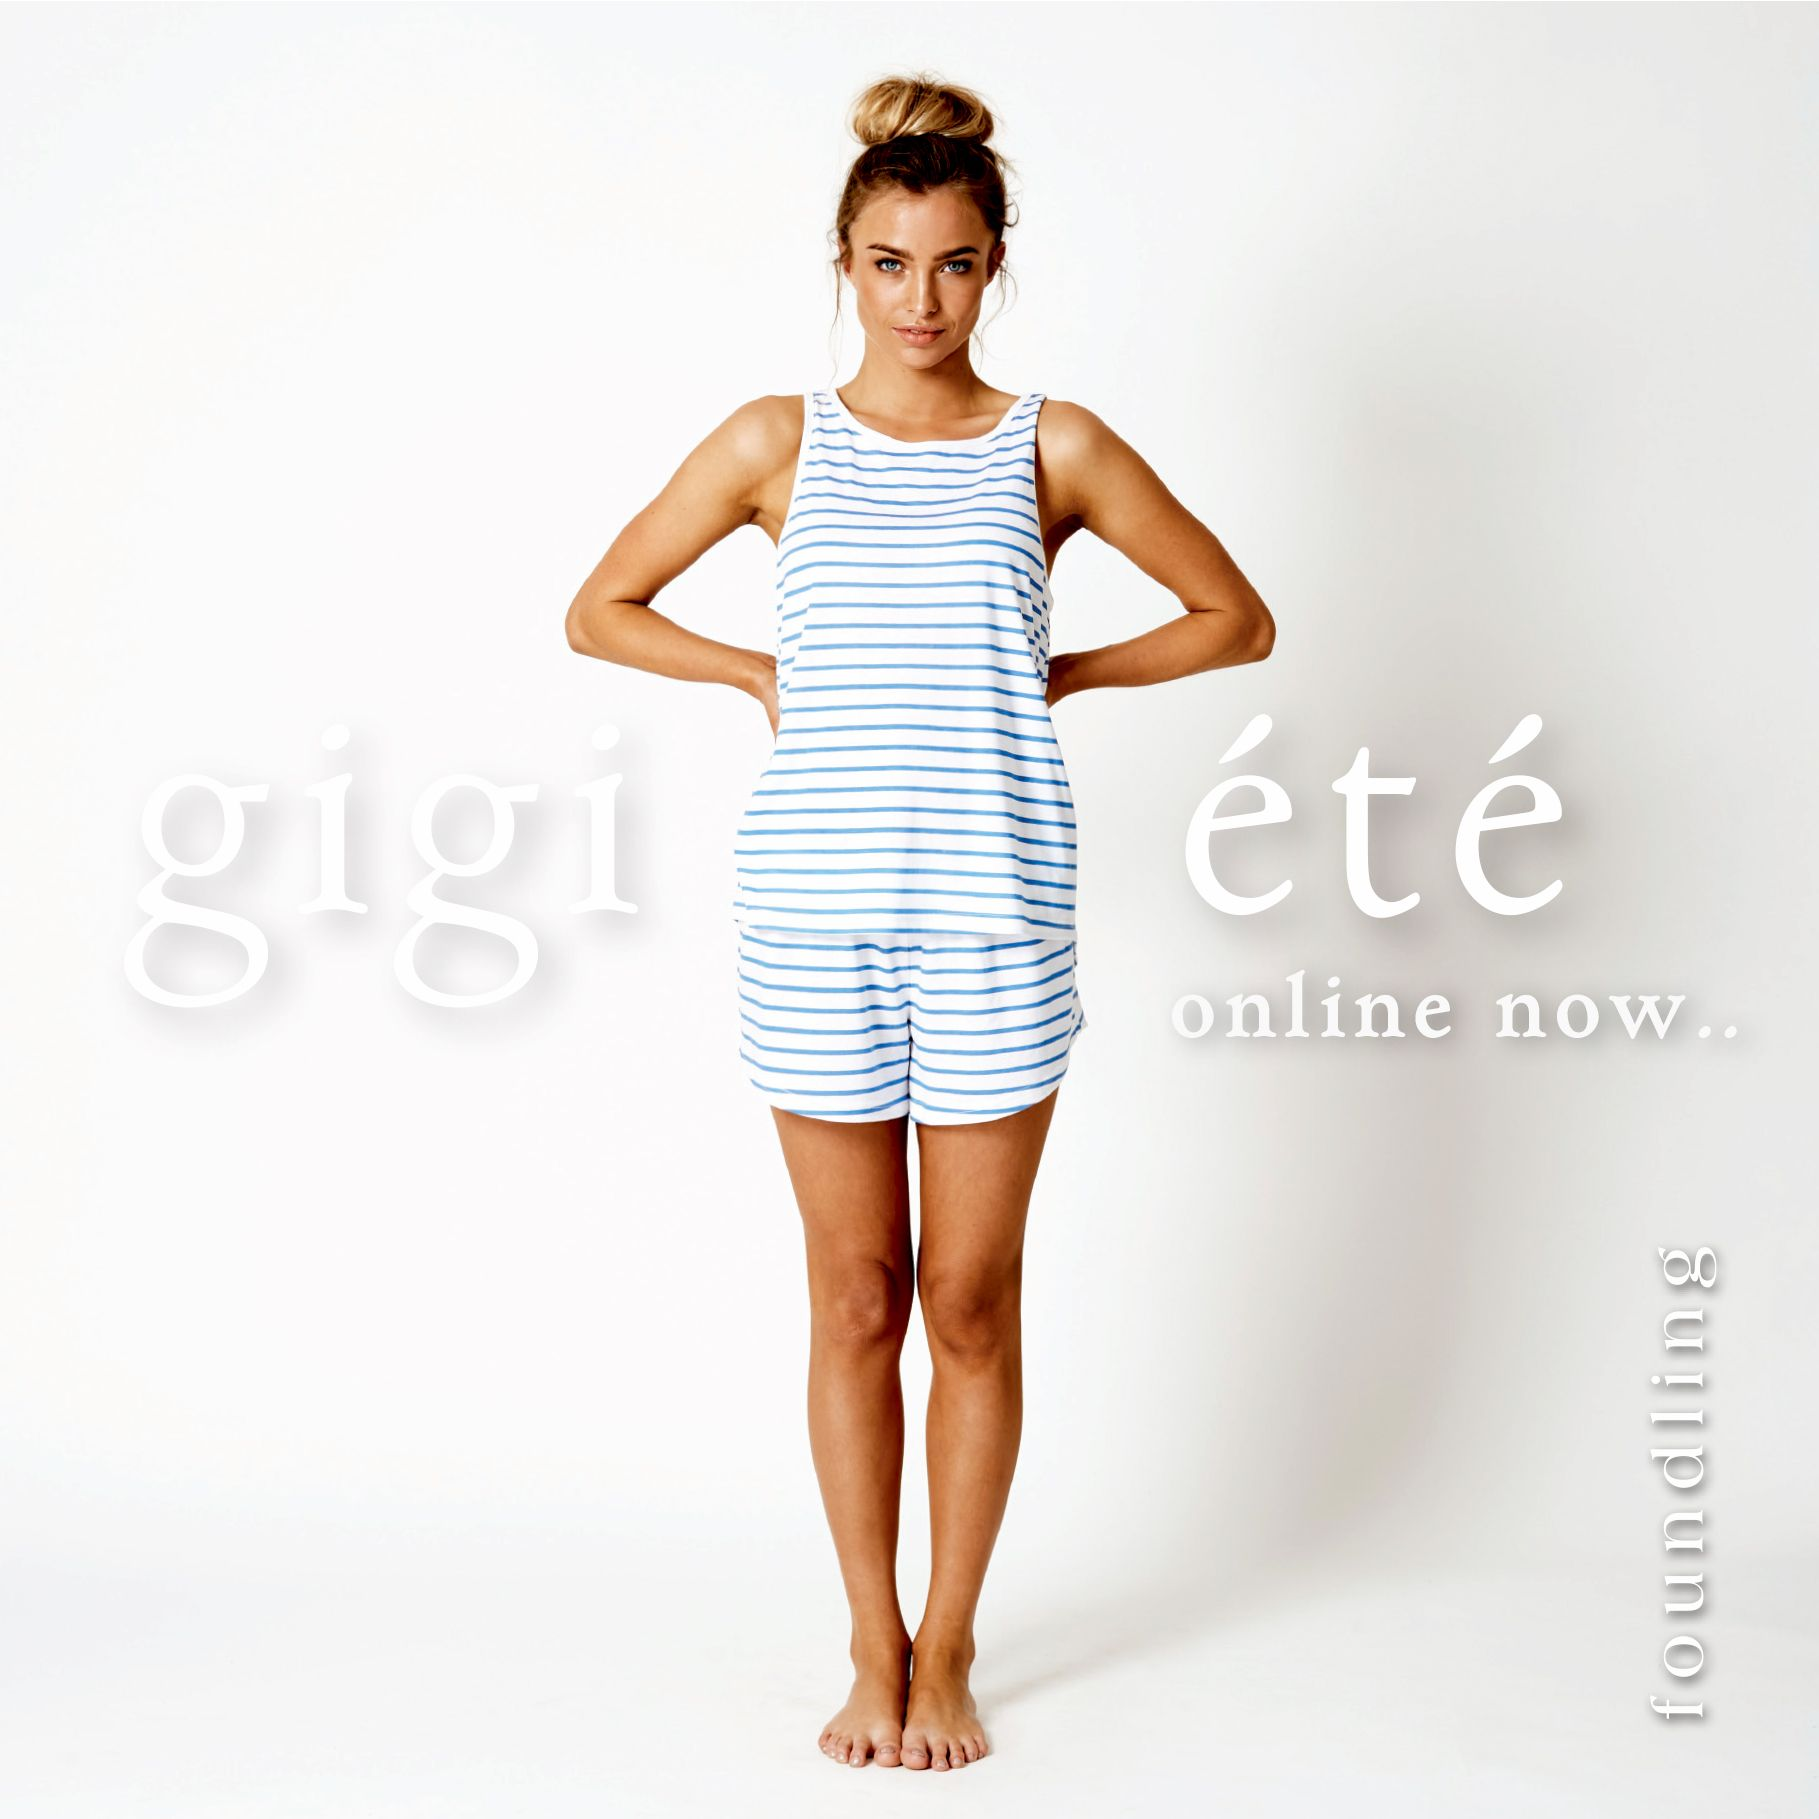 ..gigi ete lounge pj set in supersoft cotton..tres bon! www.foundling.com.au